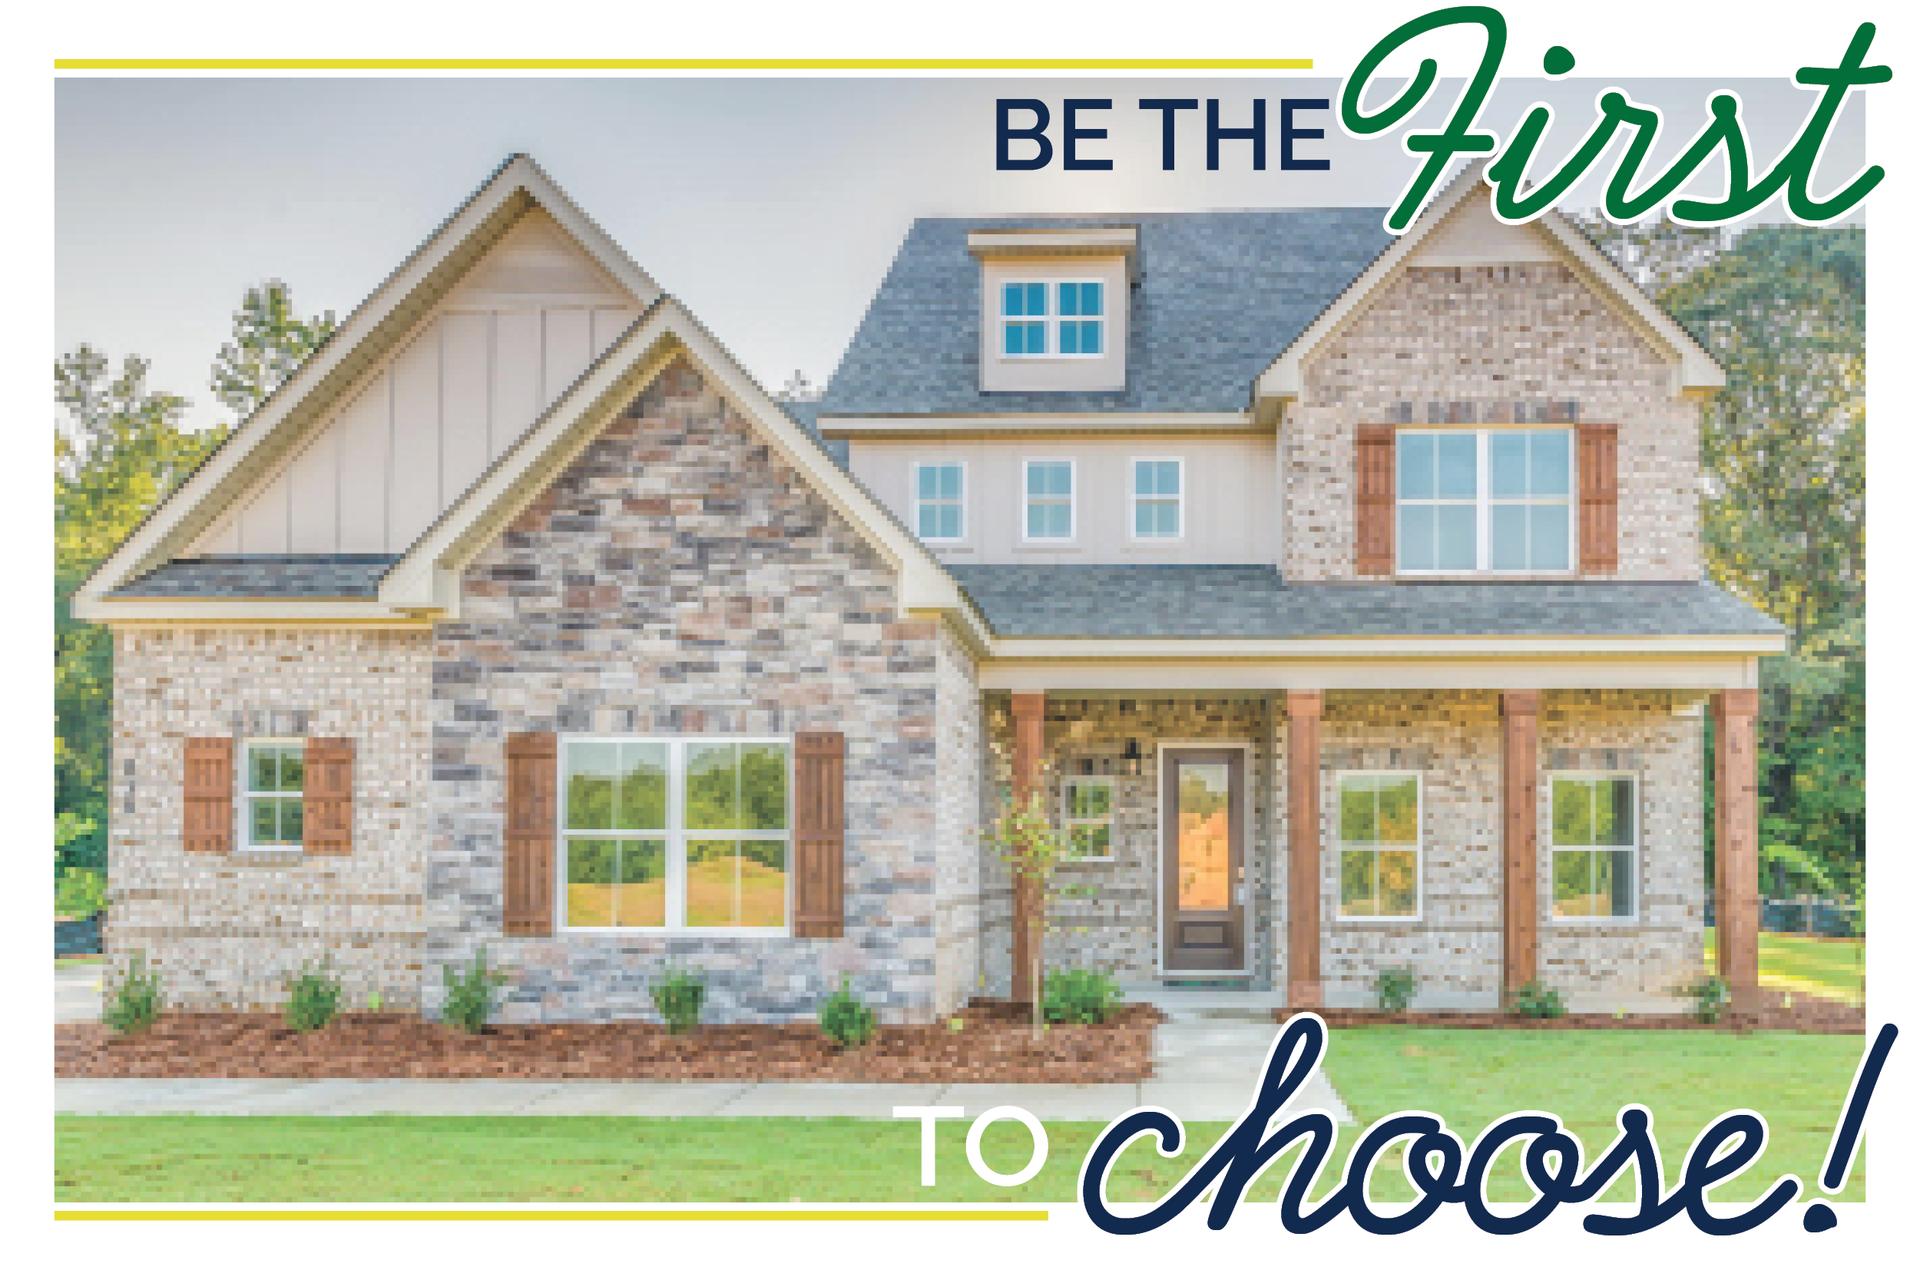 Introducing: New Phase of Homes at Donahue Ridge!